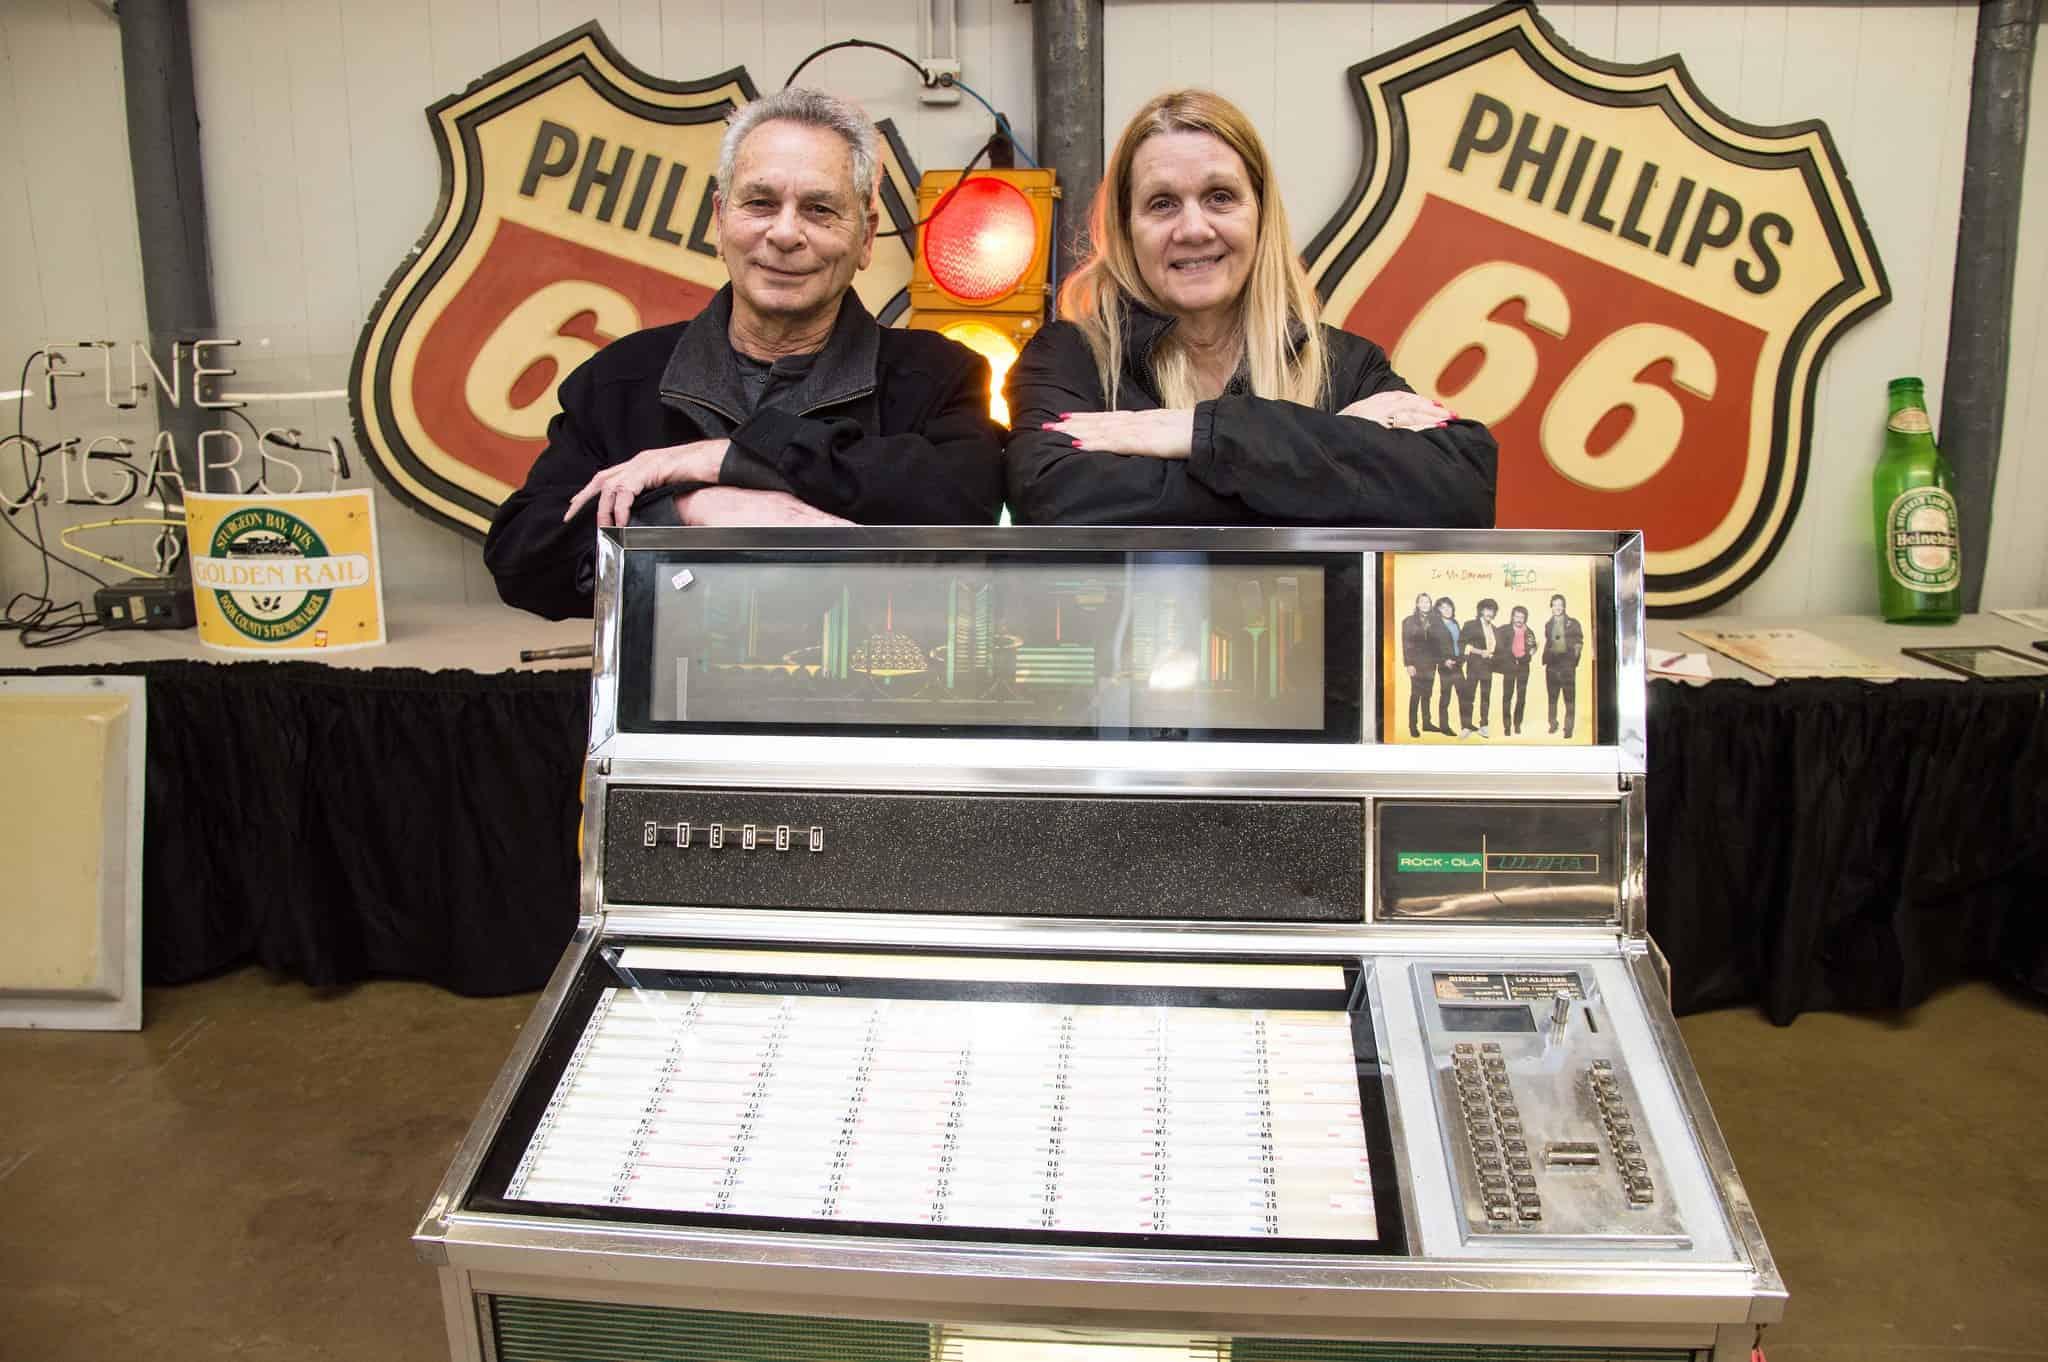 Slot Machine, Coin Op, antique advertising show